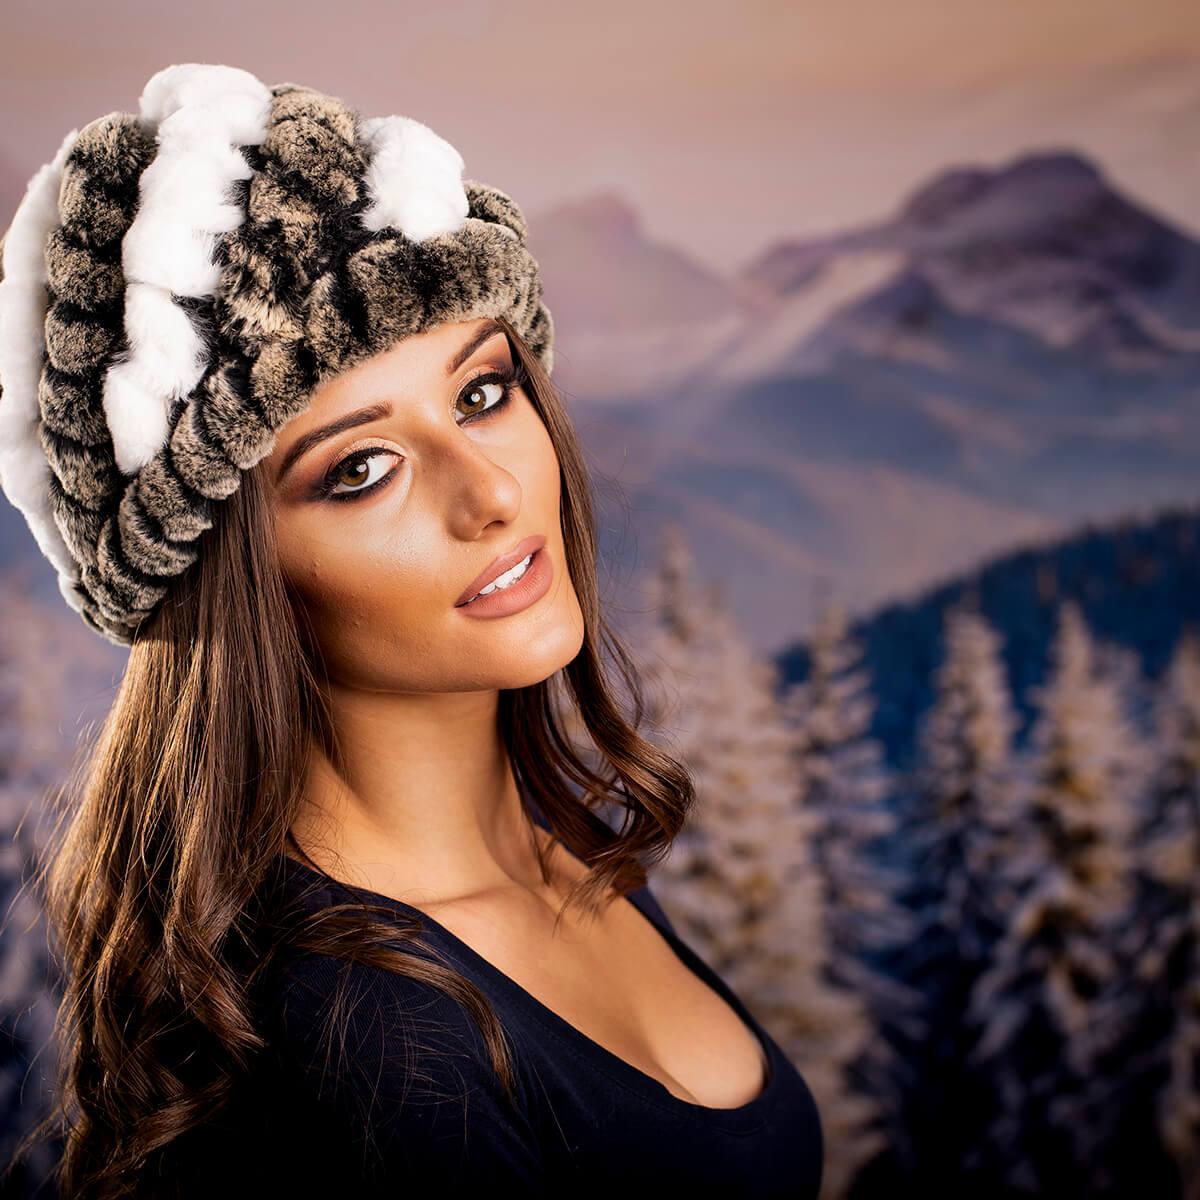 Дамска Зимна Шапка Естествен Косъм